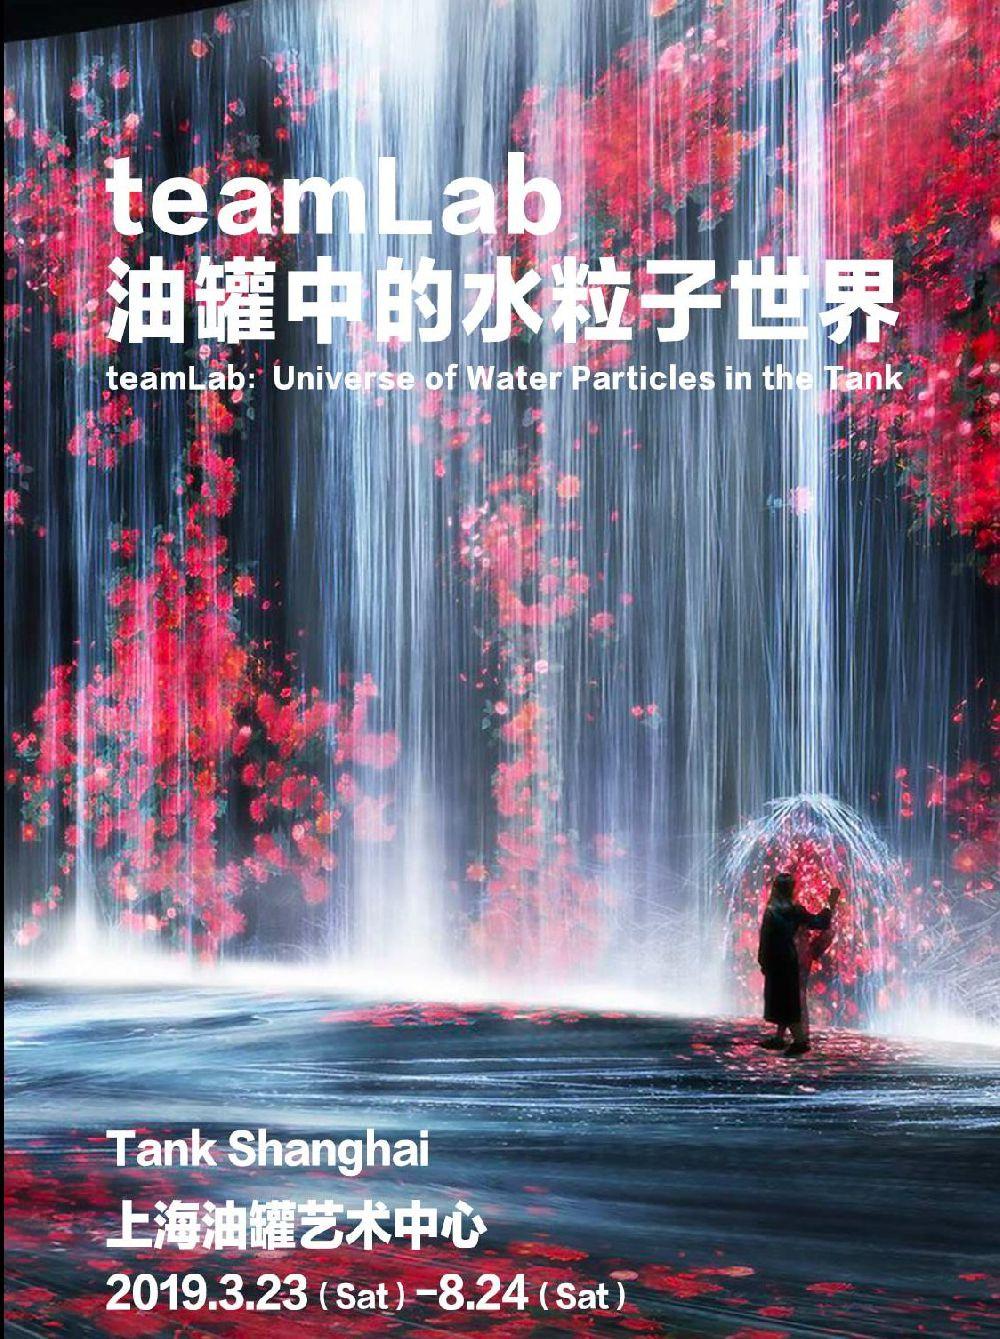 teamLab: 油罐中的水粒子世界上海展时间+门票